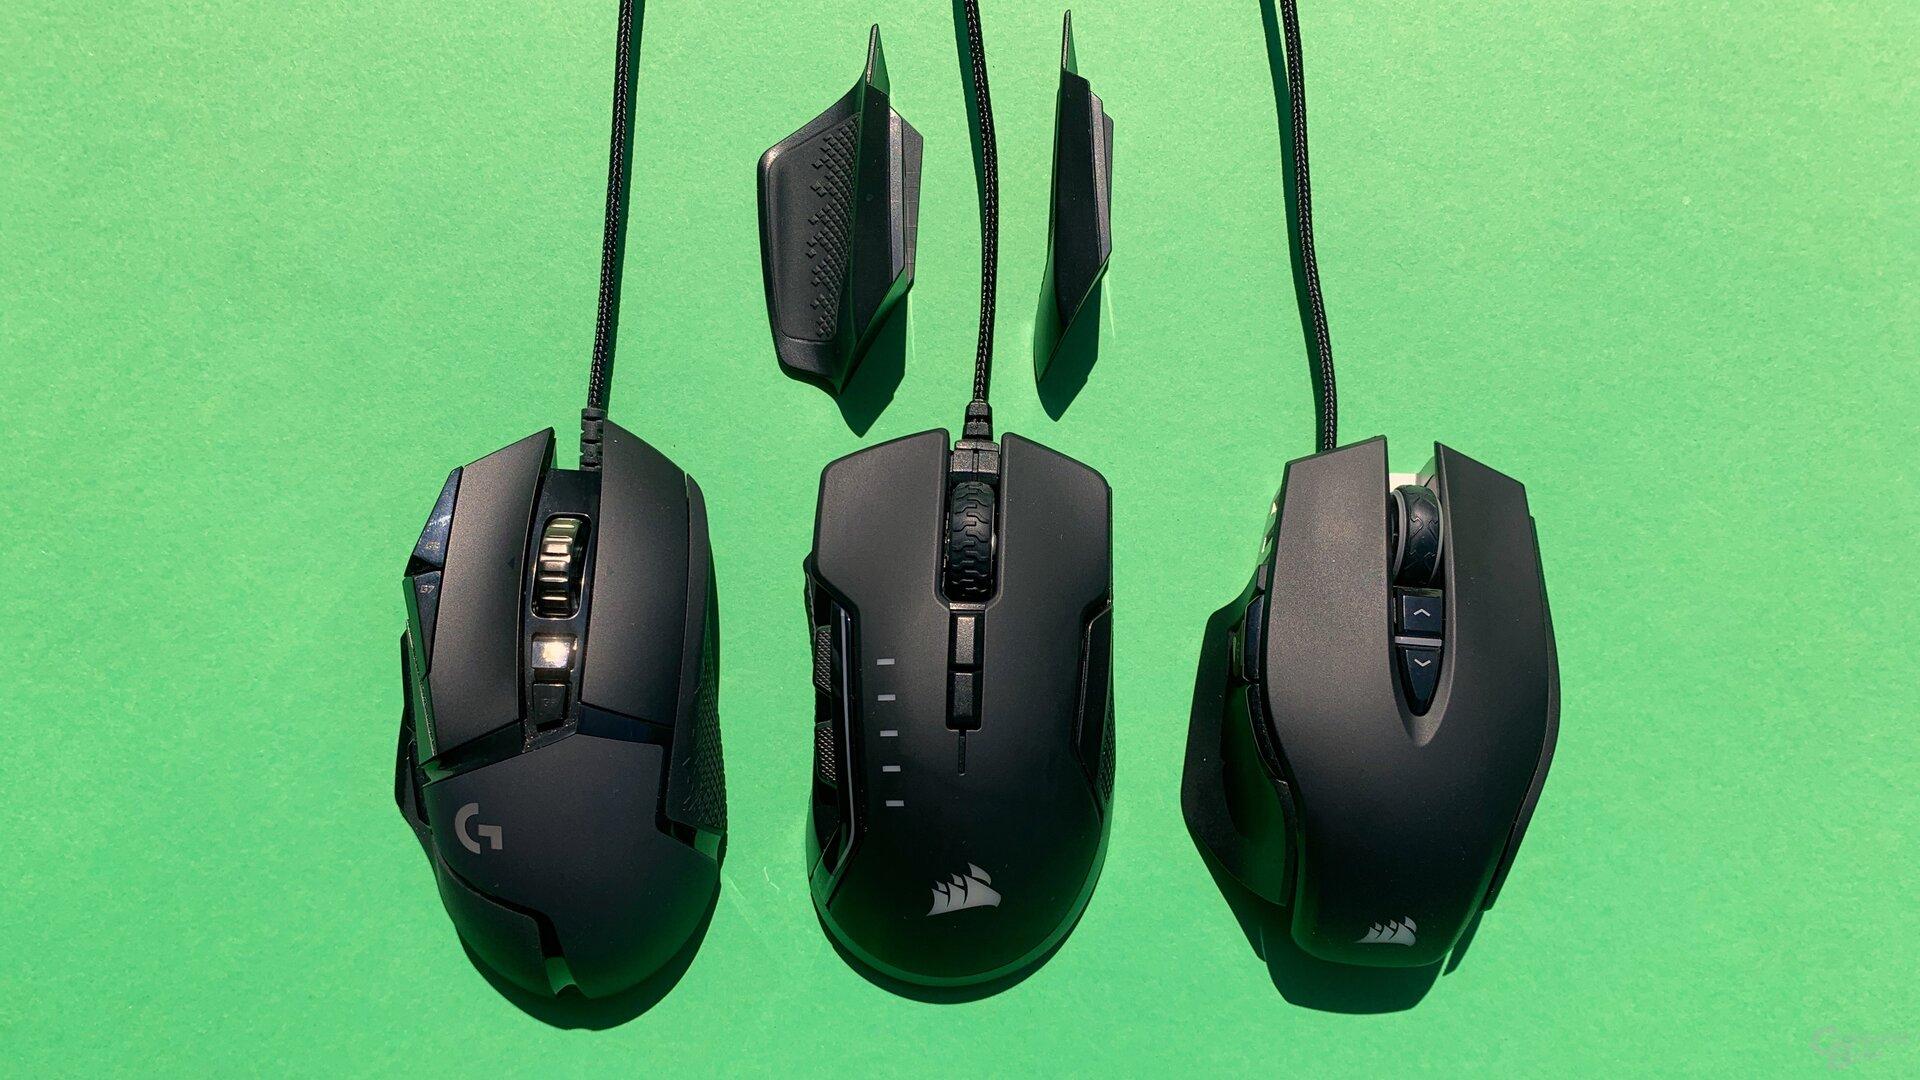 Logitech G502 Hero, Corsair Glaive RGB Pro und Corsair M65 RGB Elite